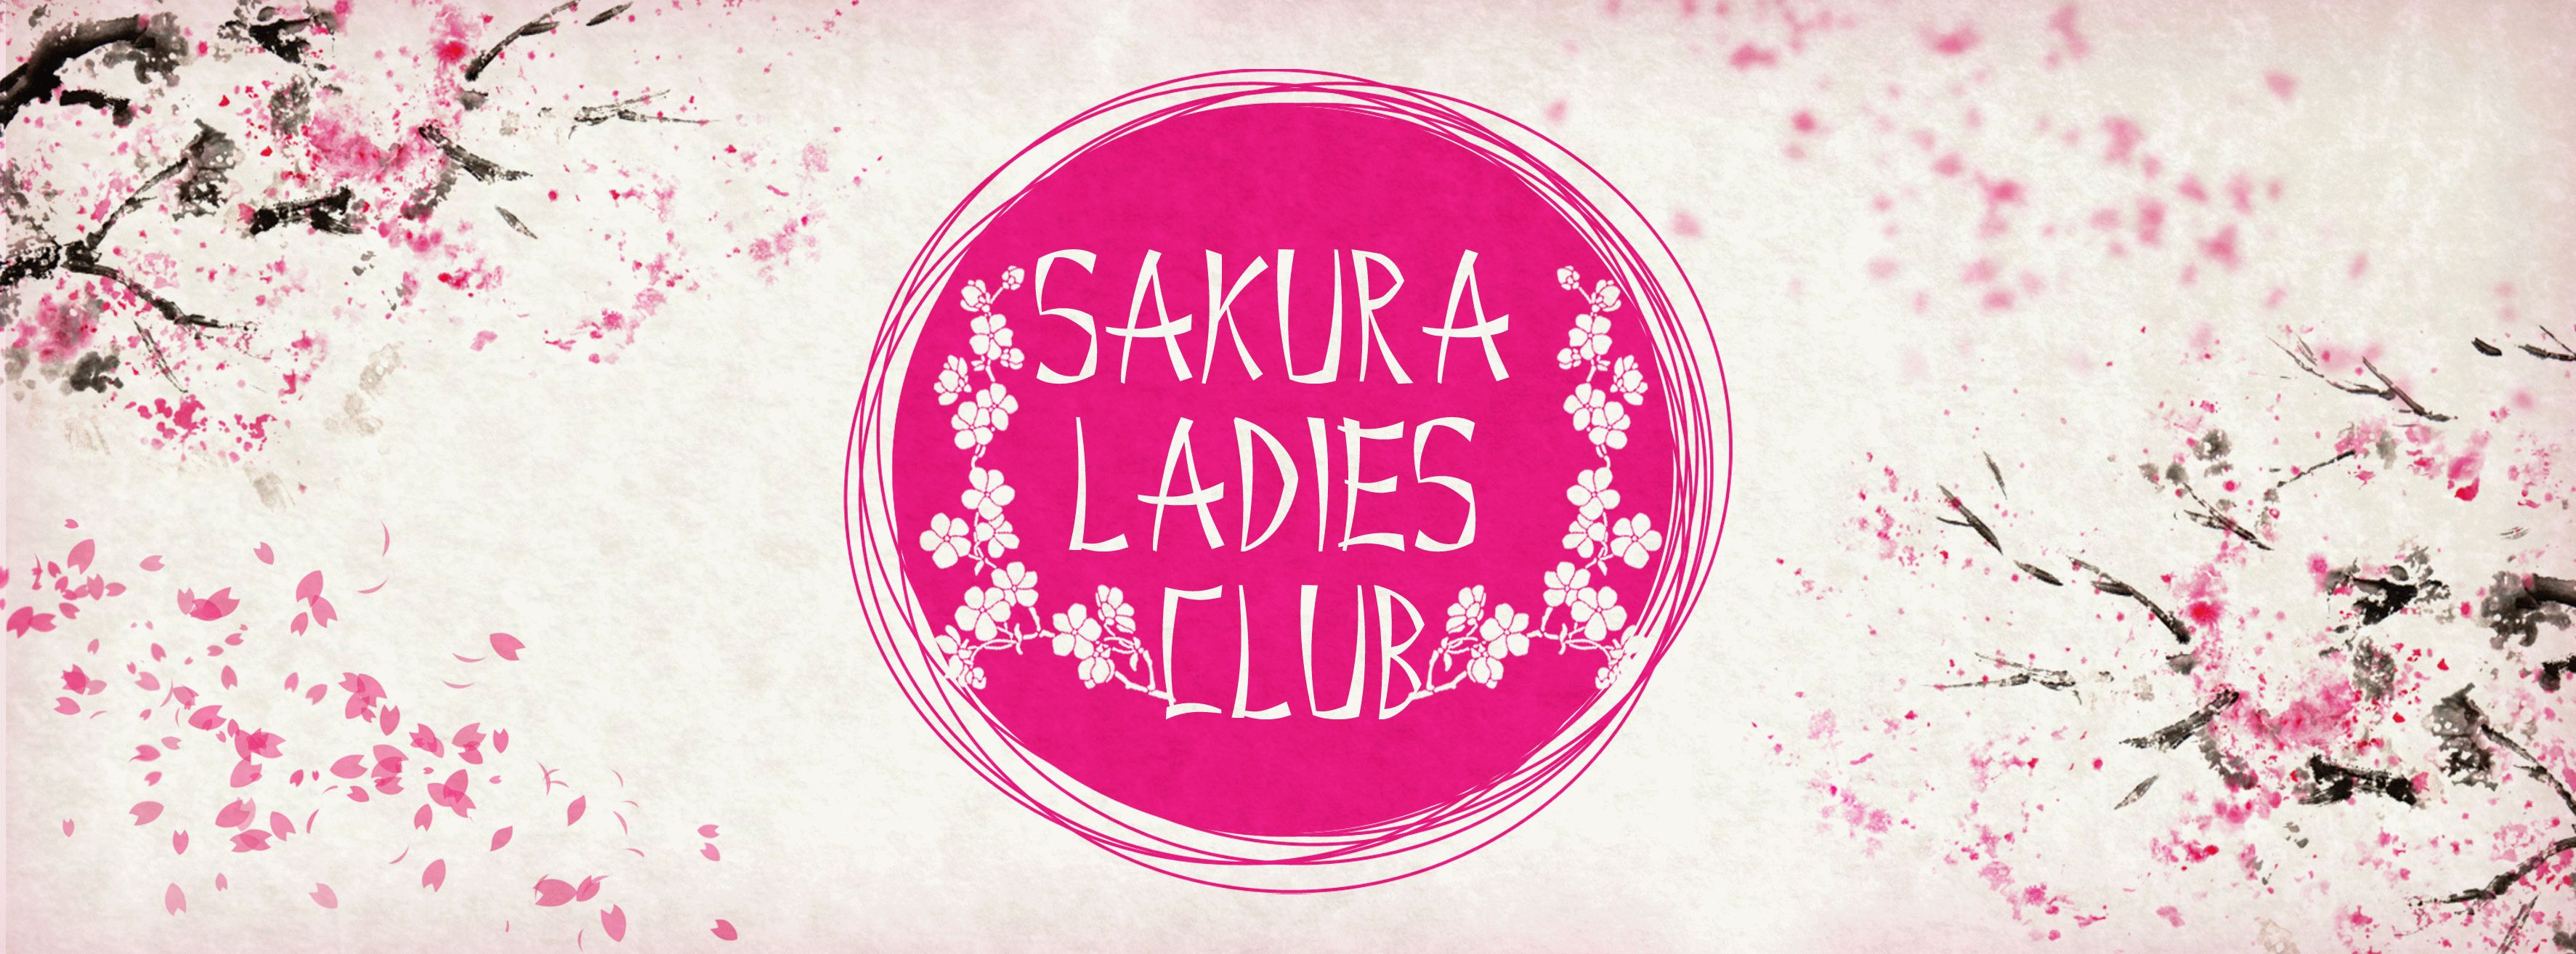 Sakura Ladies Club Party PSD Flyer Template